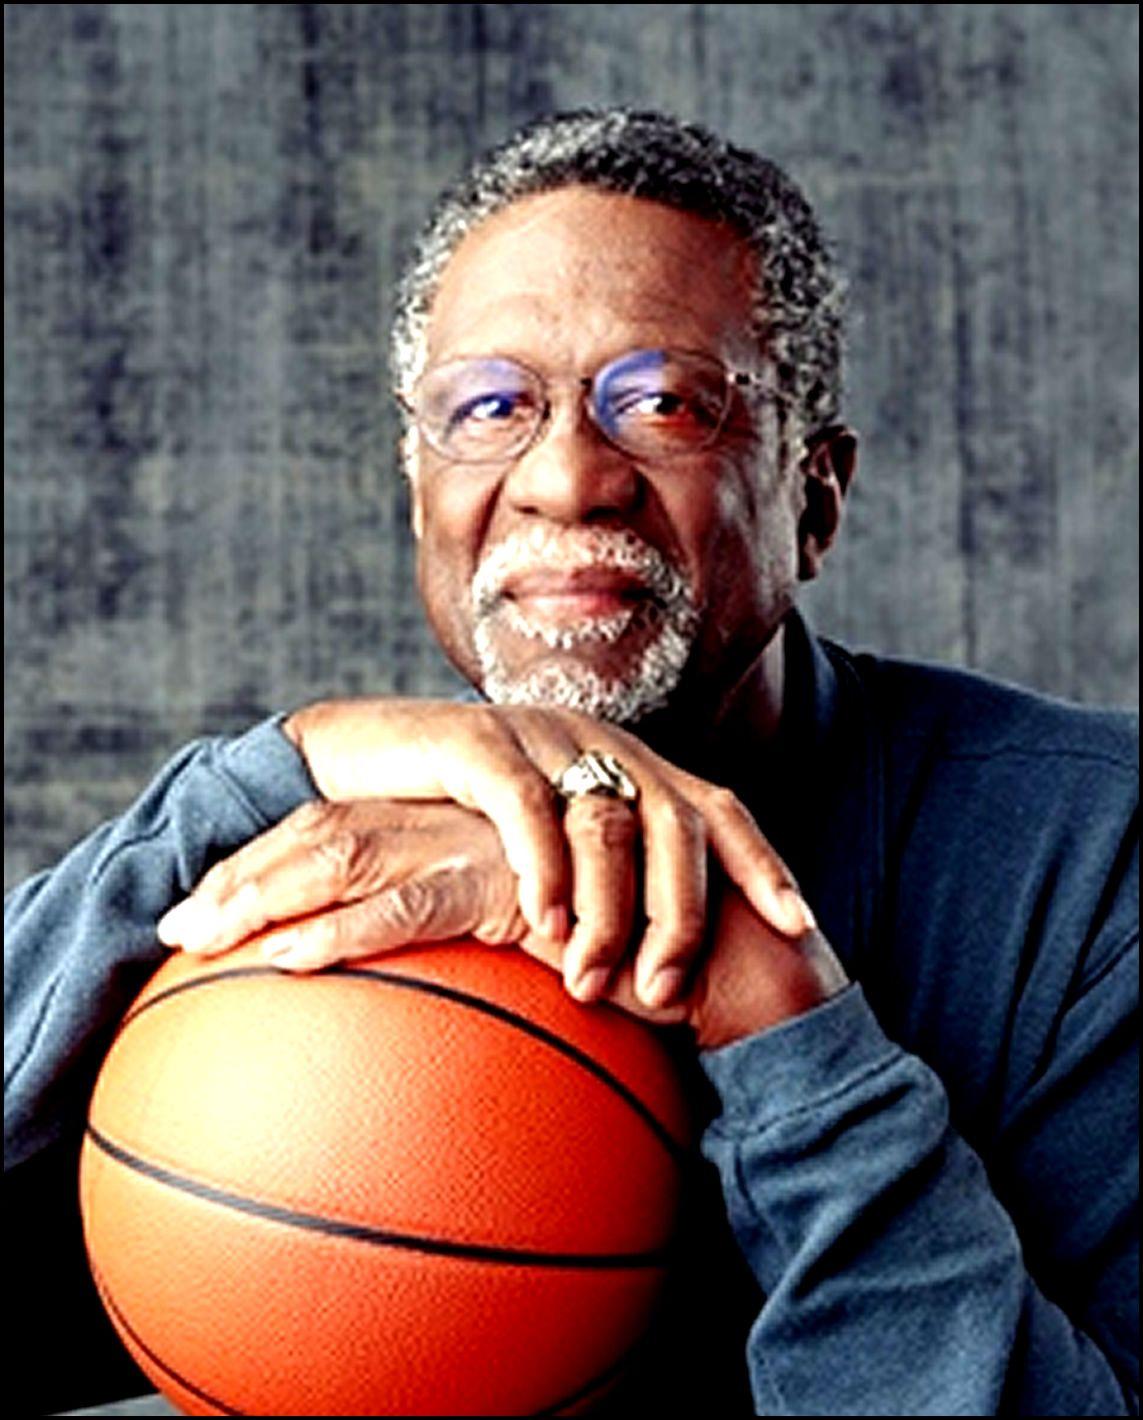 2009 NBA Finals MVP trophy renamed as the Bill Russell NBA